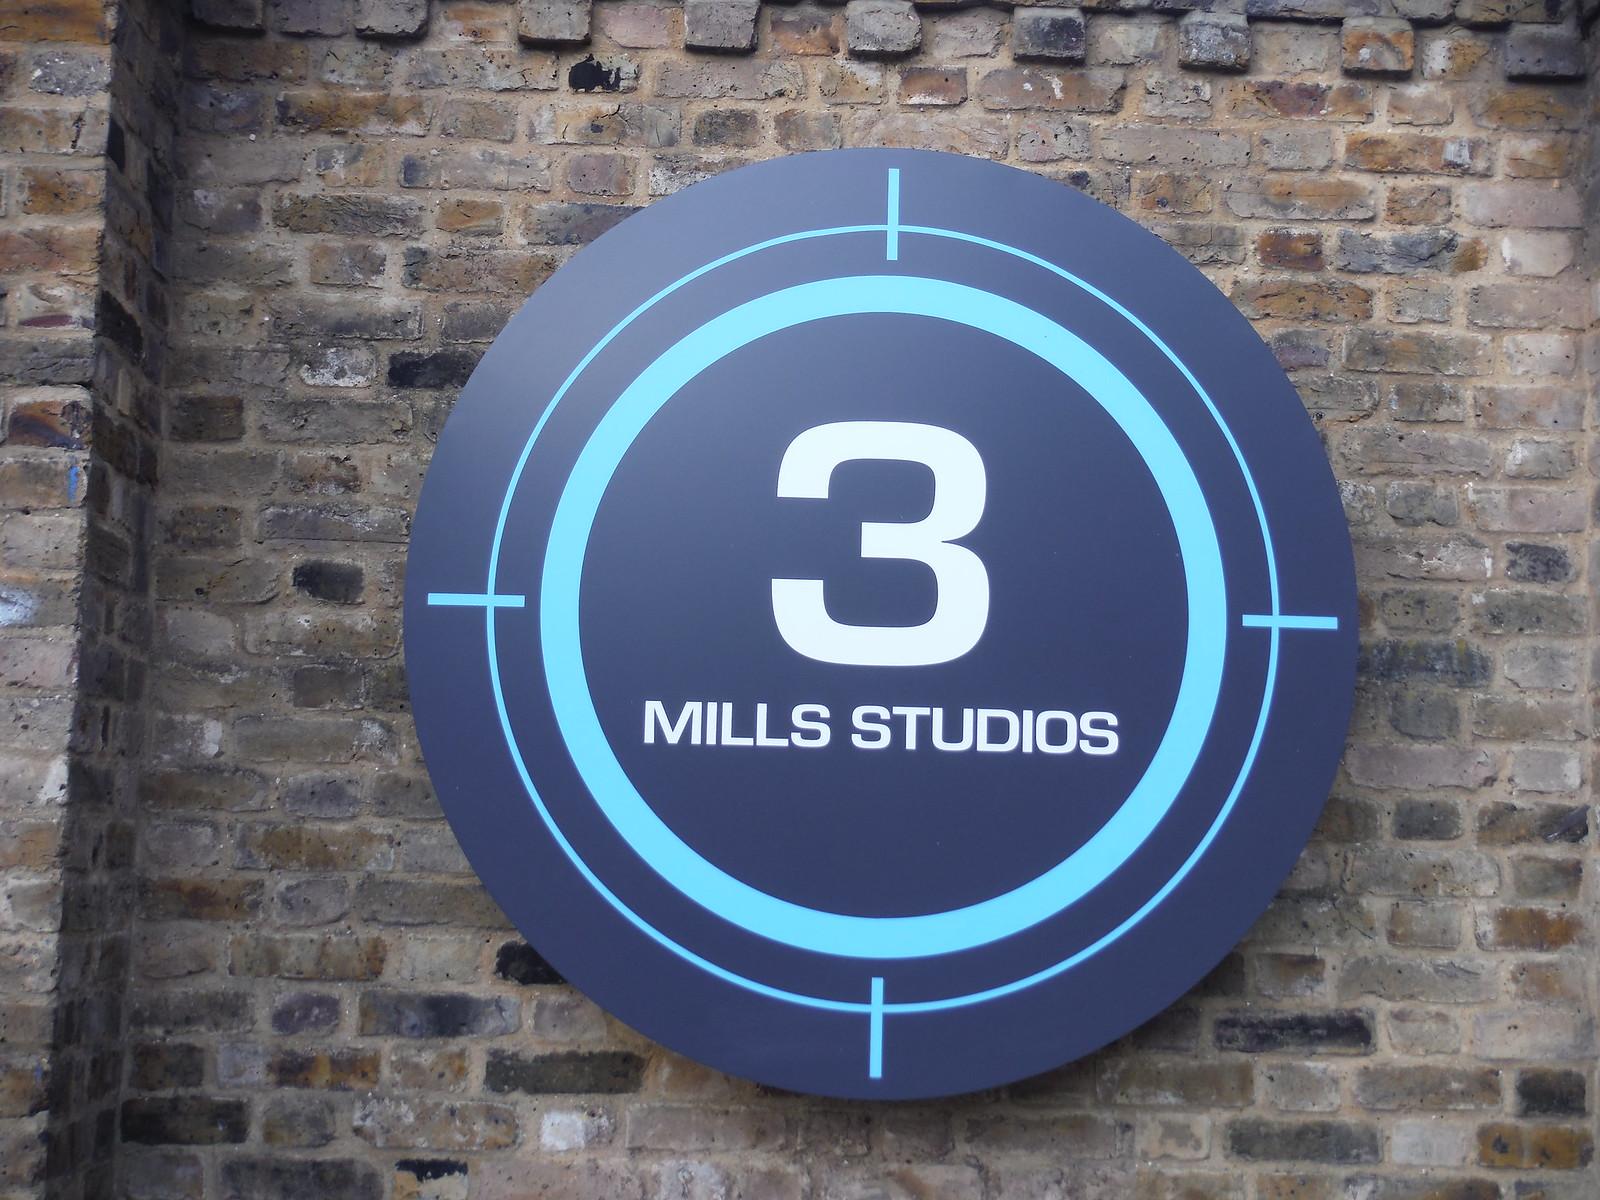 Three Mills Studios SWC Short Walk 21 - The Line Modern Art Walk (Stratford to North Greenwich)